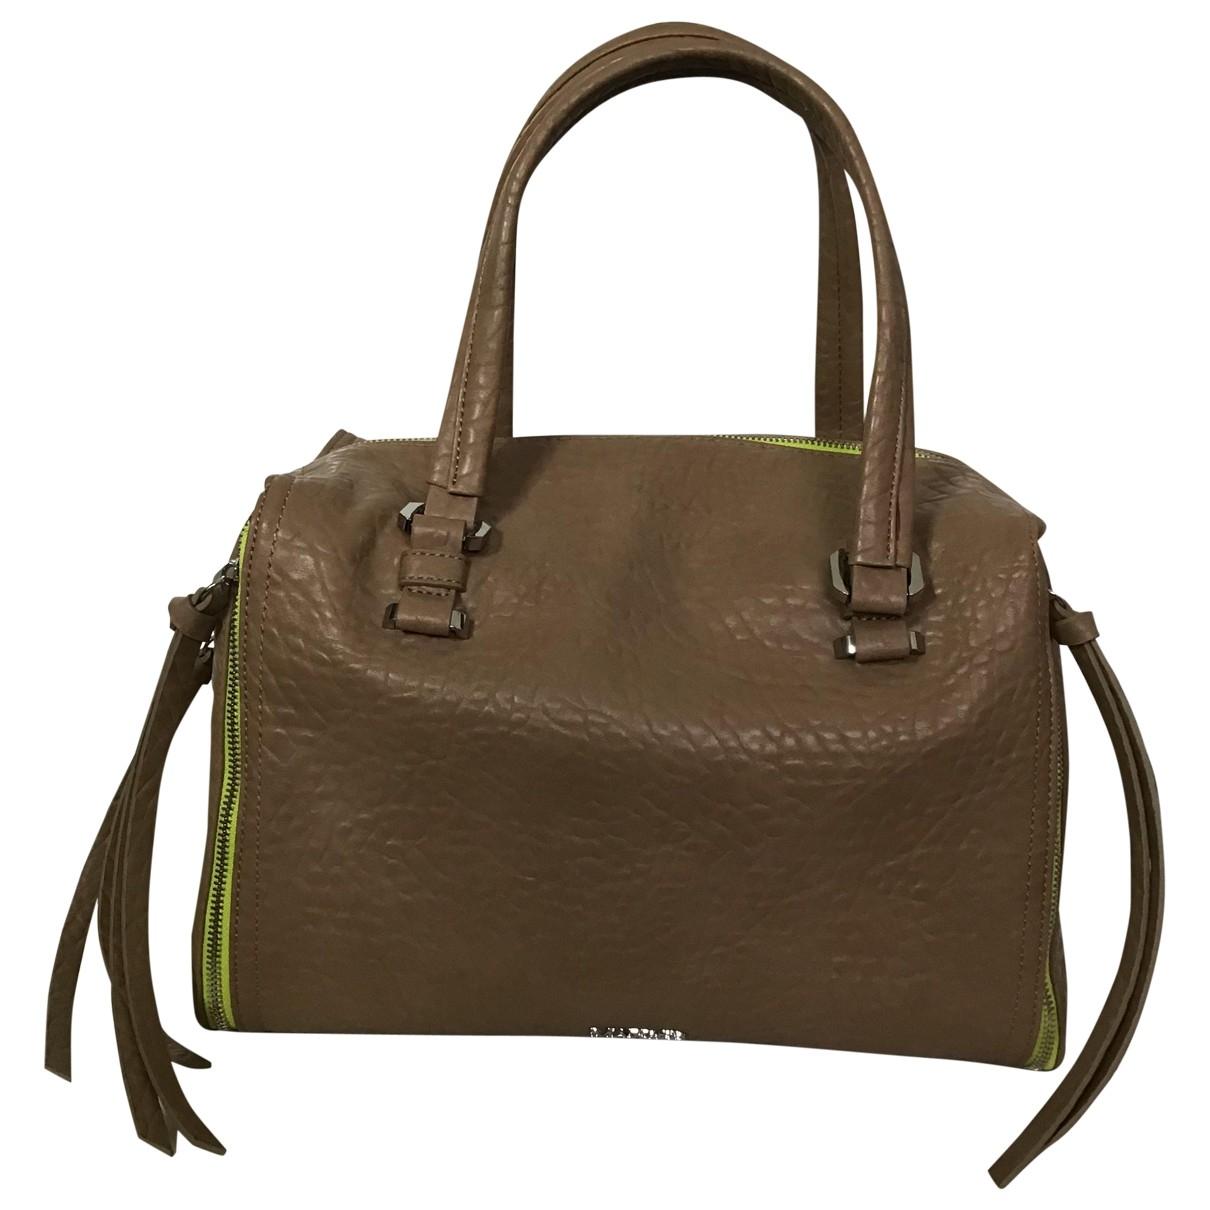 Max & Co \N Handtasche in  Braun Synthetik